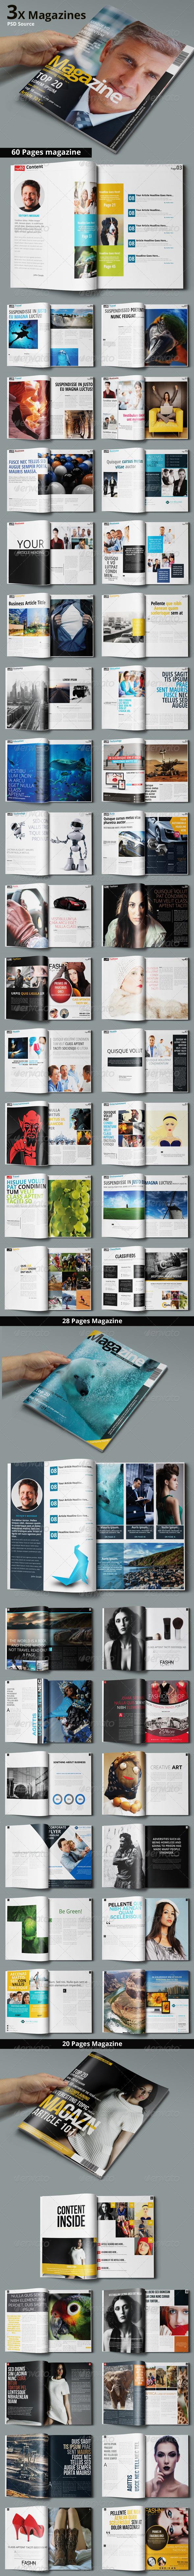 GraphicRiver Multipurpose Magazine Bundle Photoshop PSD 7466589